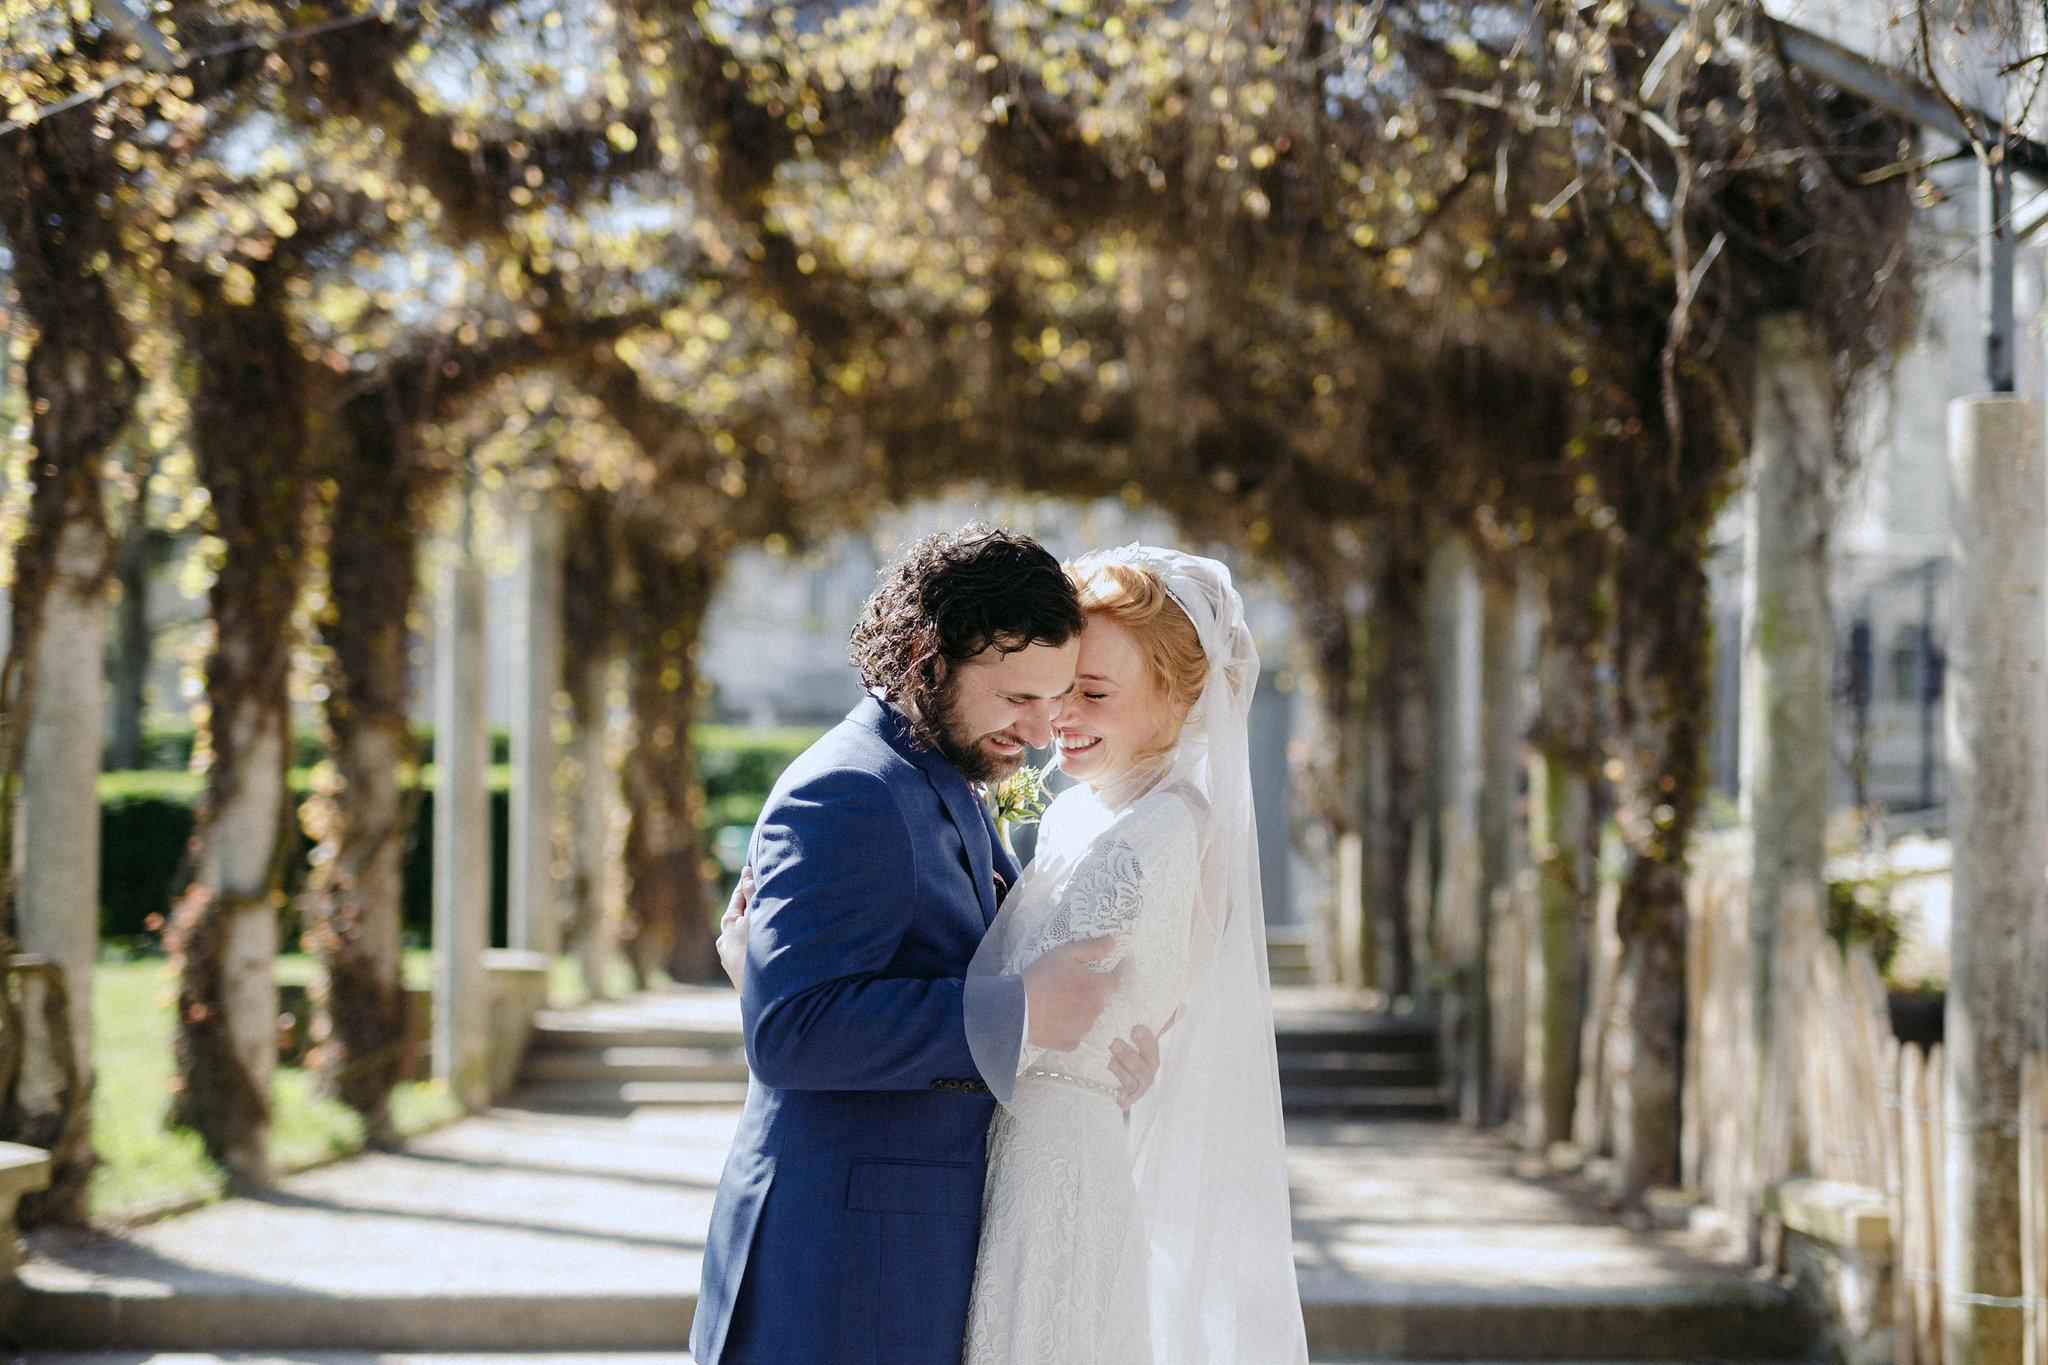 Paris_elopement_wedding_photographer-208.jpg